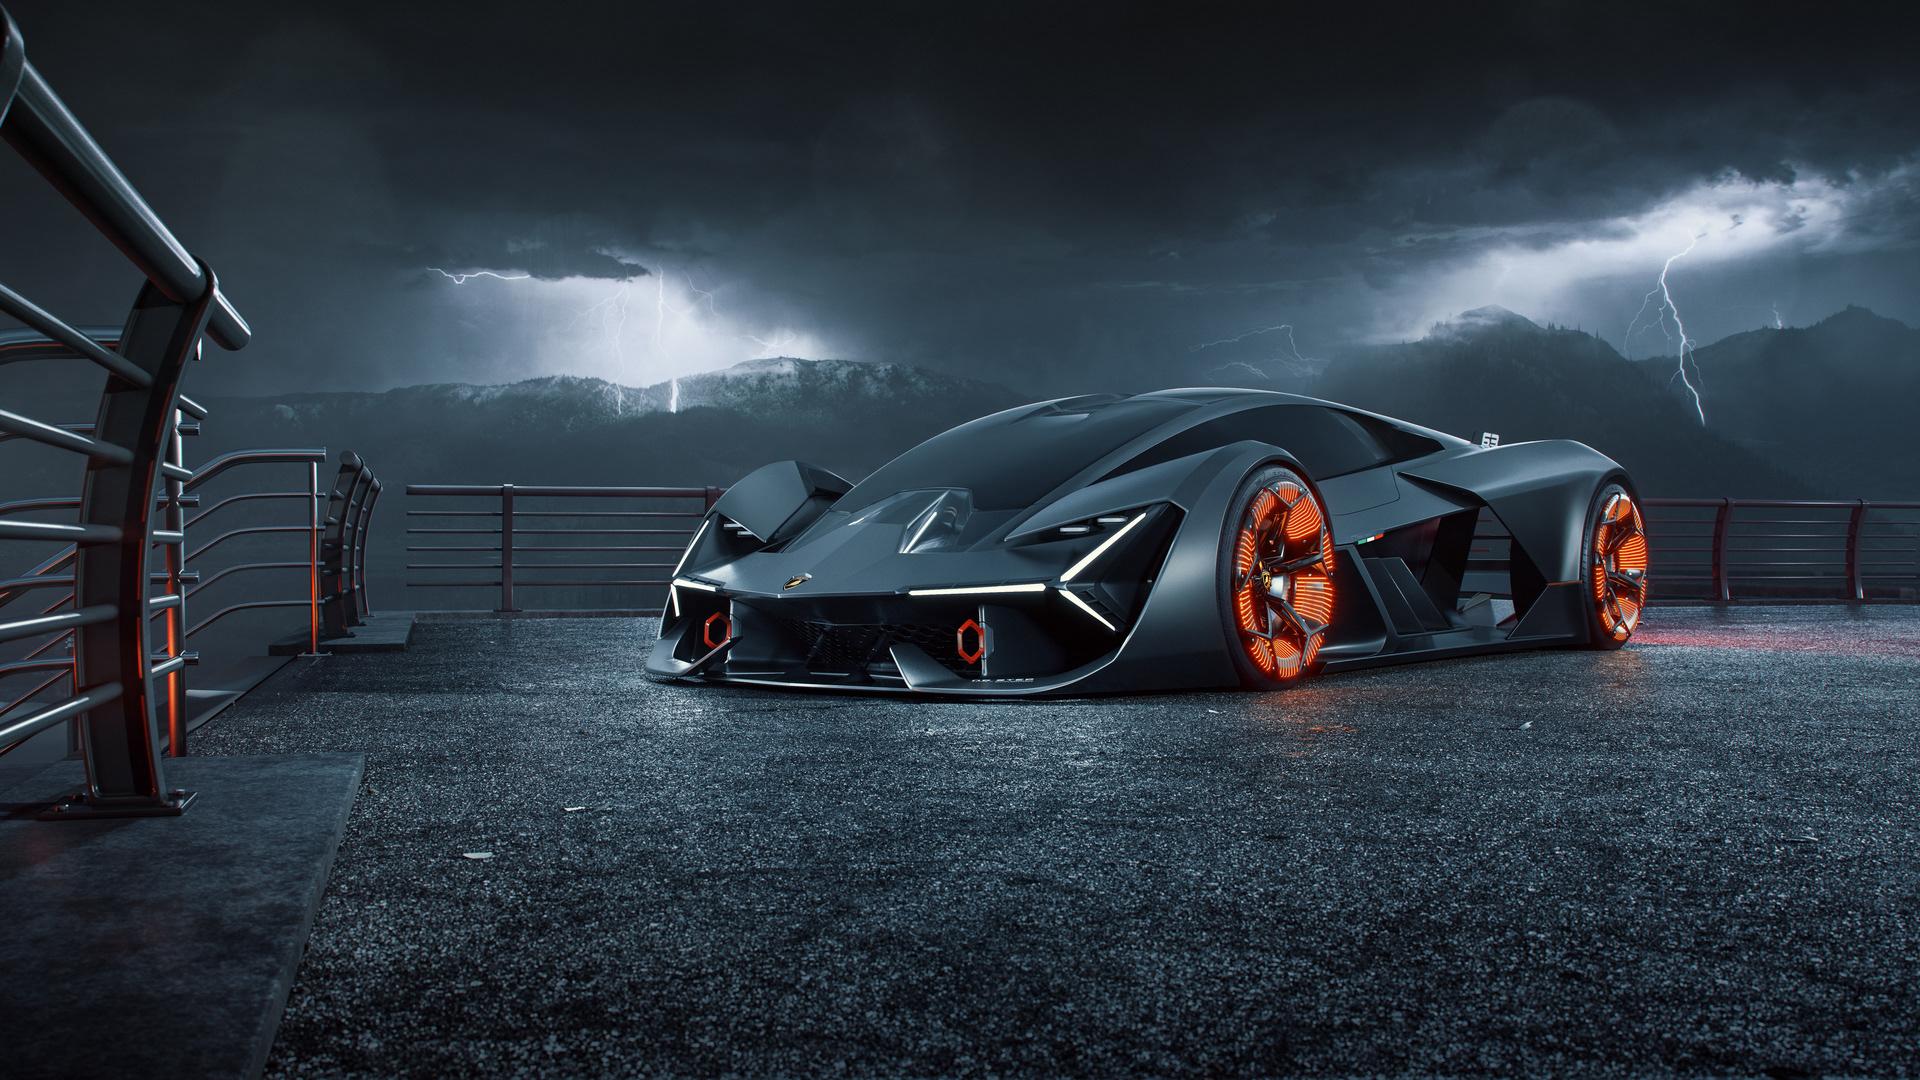 Lamborghini Terzo Millennio Digital Art 2019, HD Cars, 4k ...